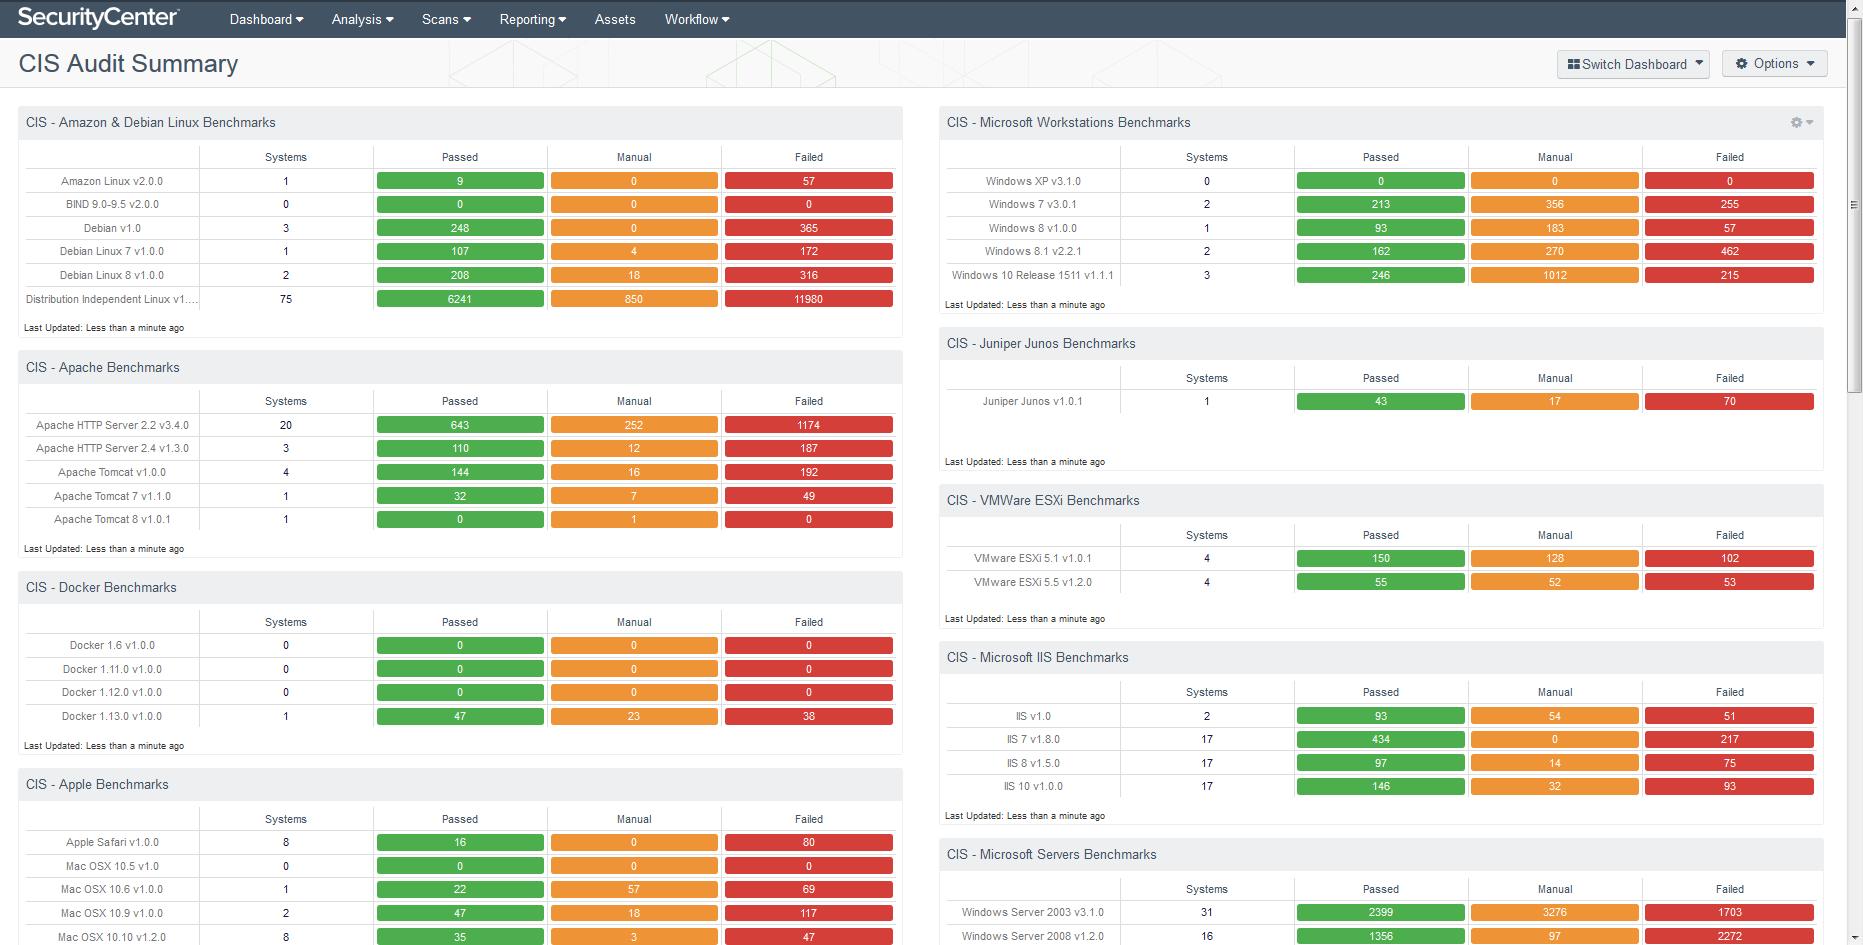 CIS Audit Summary dashboard